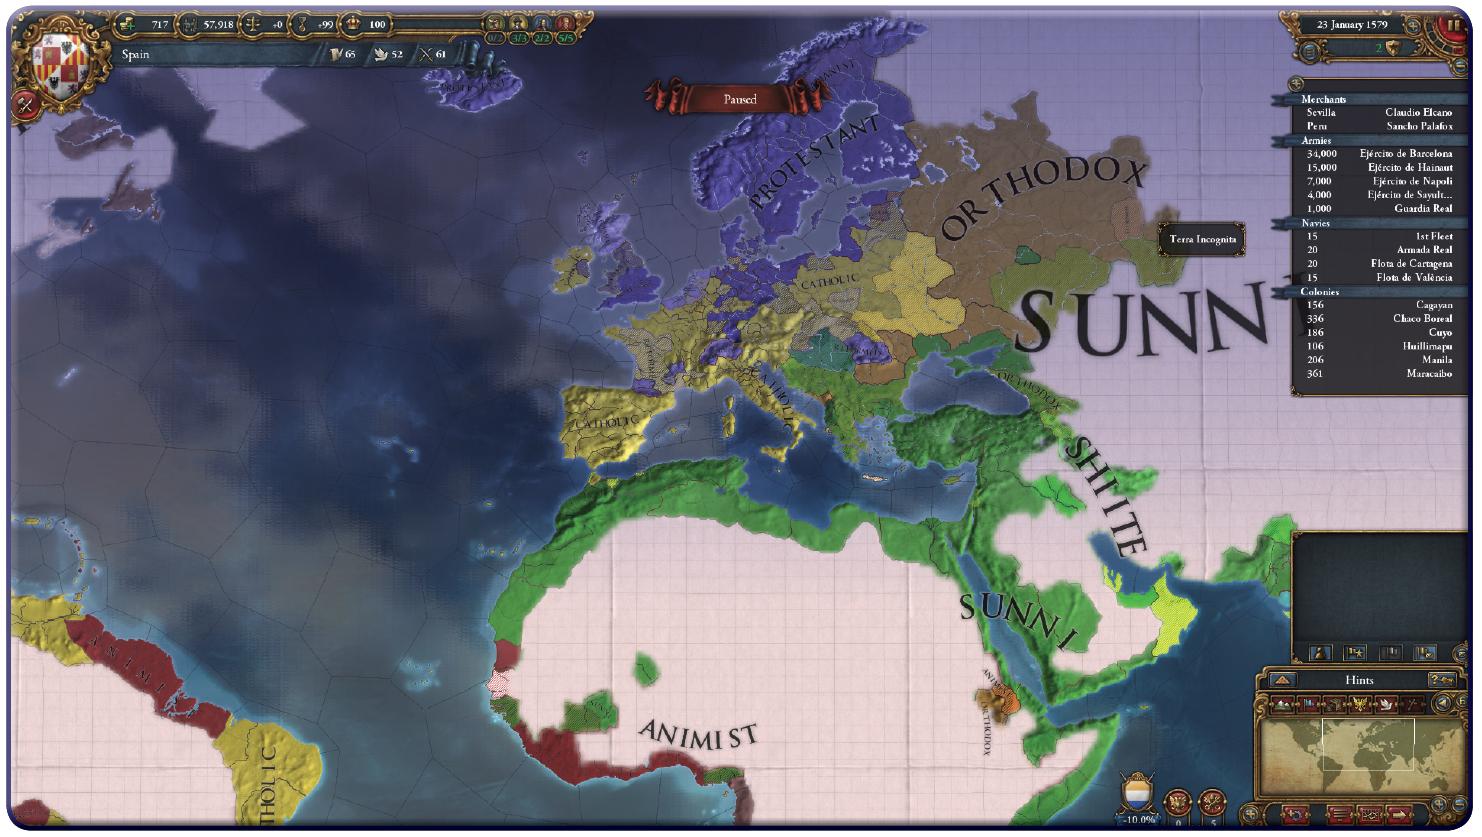 Europa Universalis IV religions